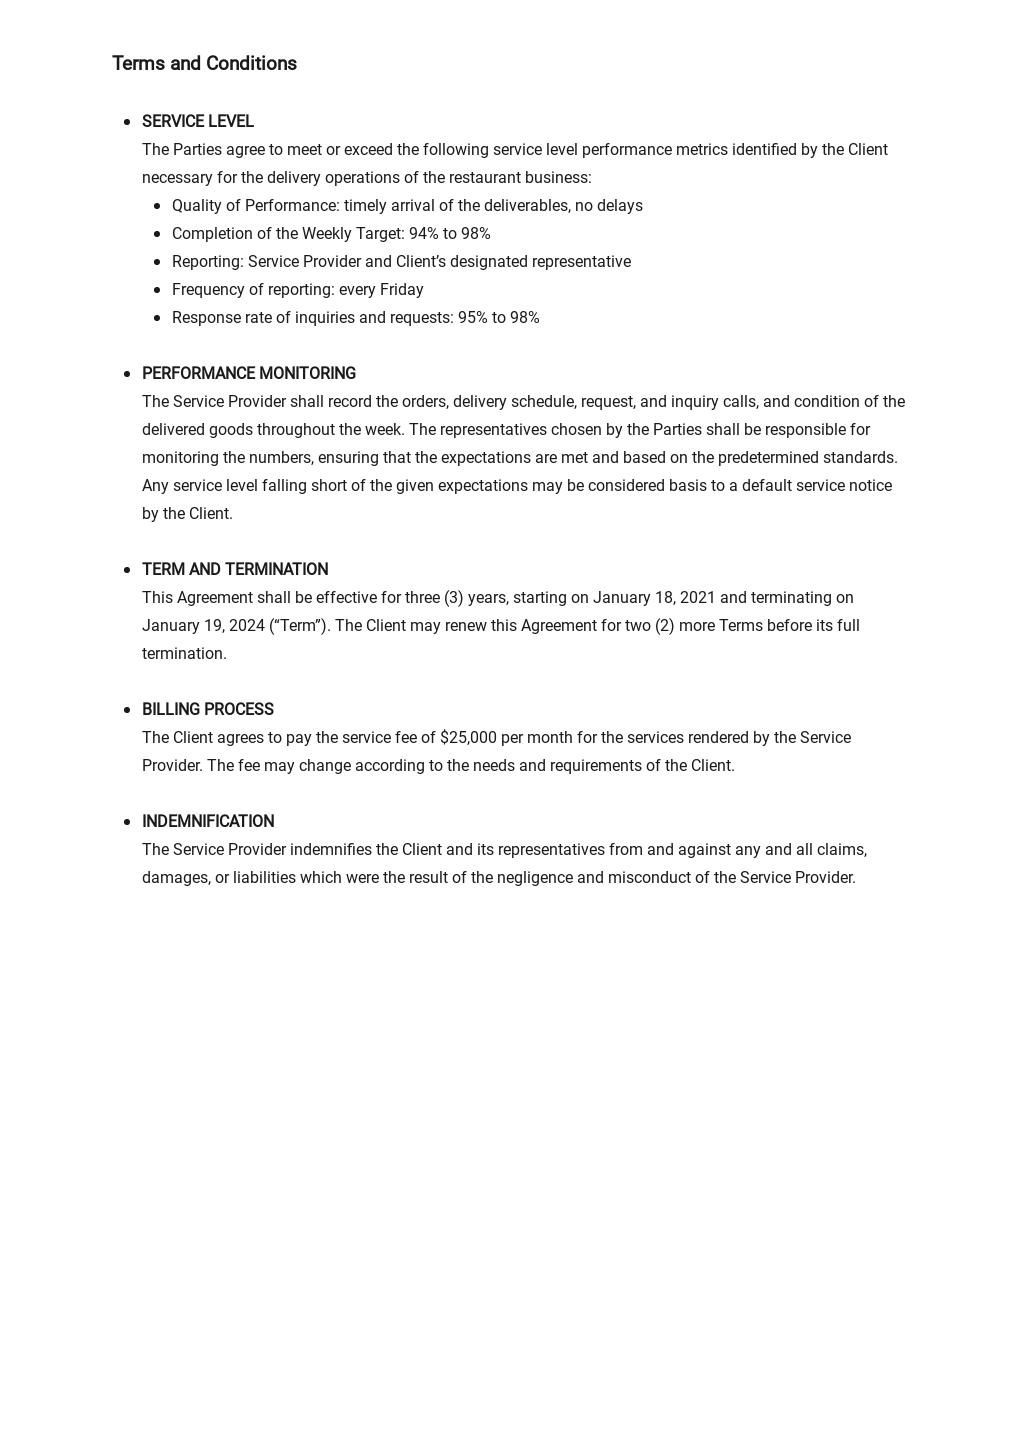 Restaurant Service Level Agreement Template 2.jpe